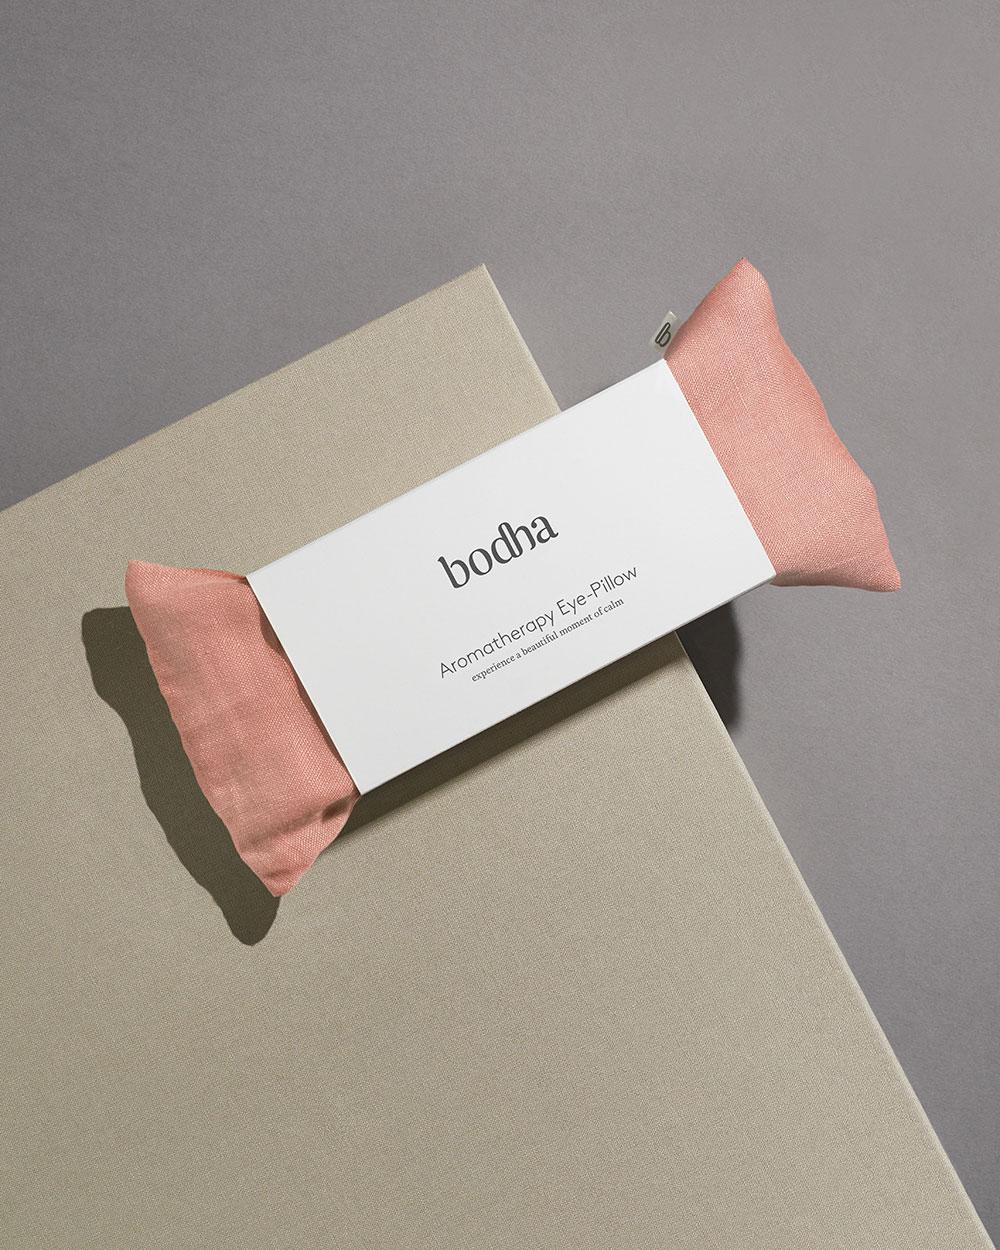 Bodha+Blush+Eye-Pillow.jpg